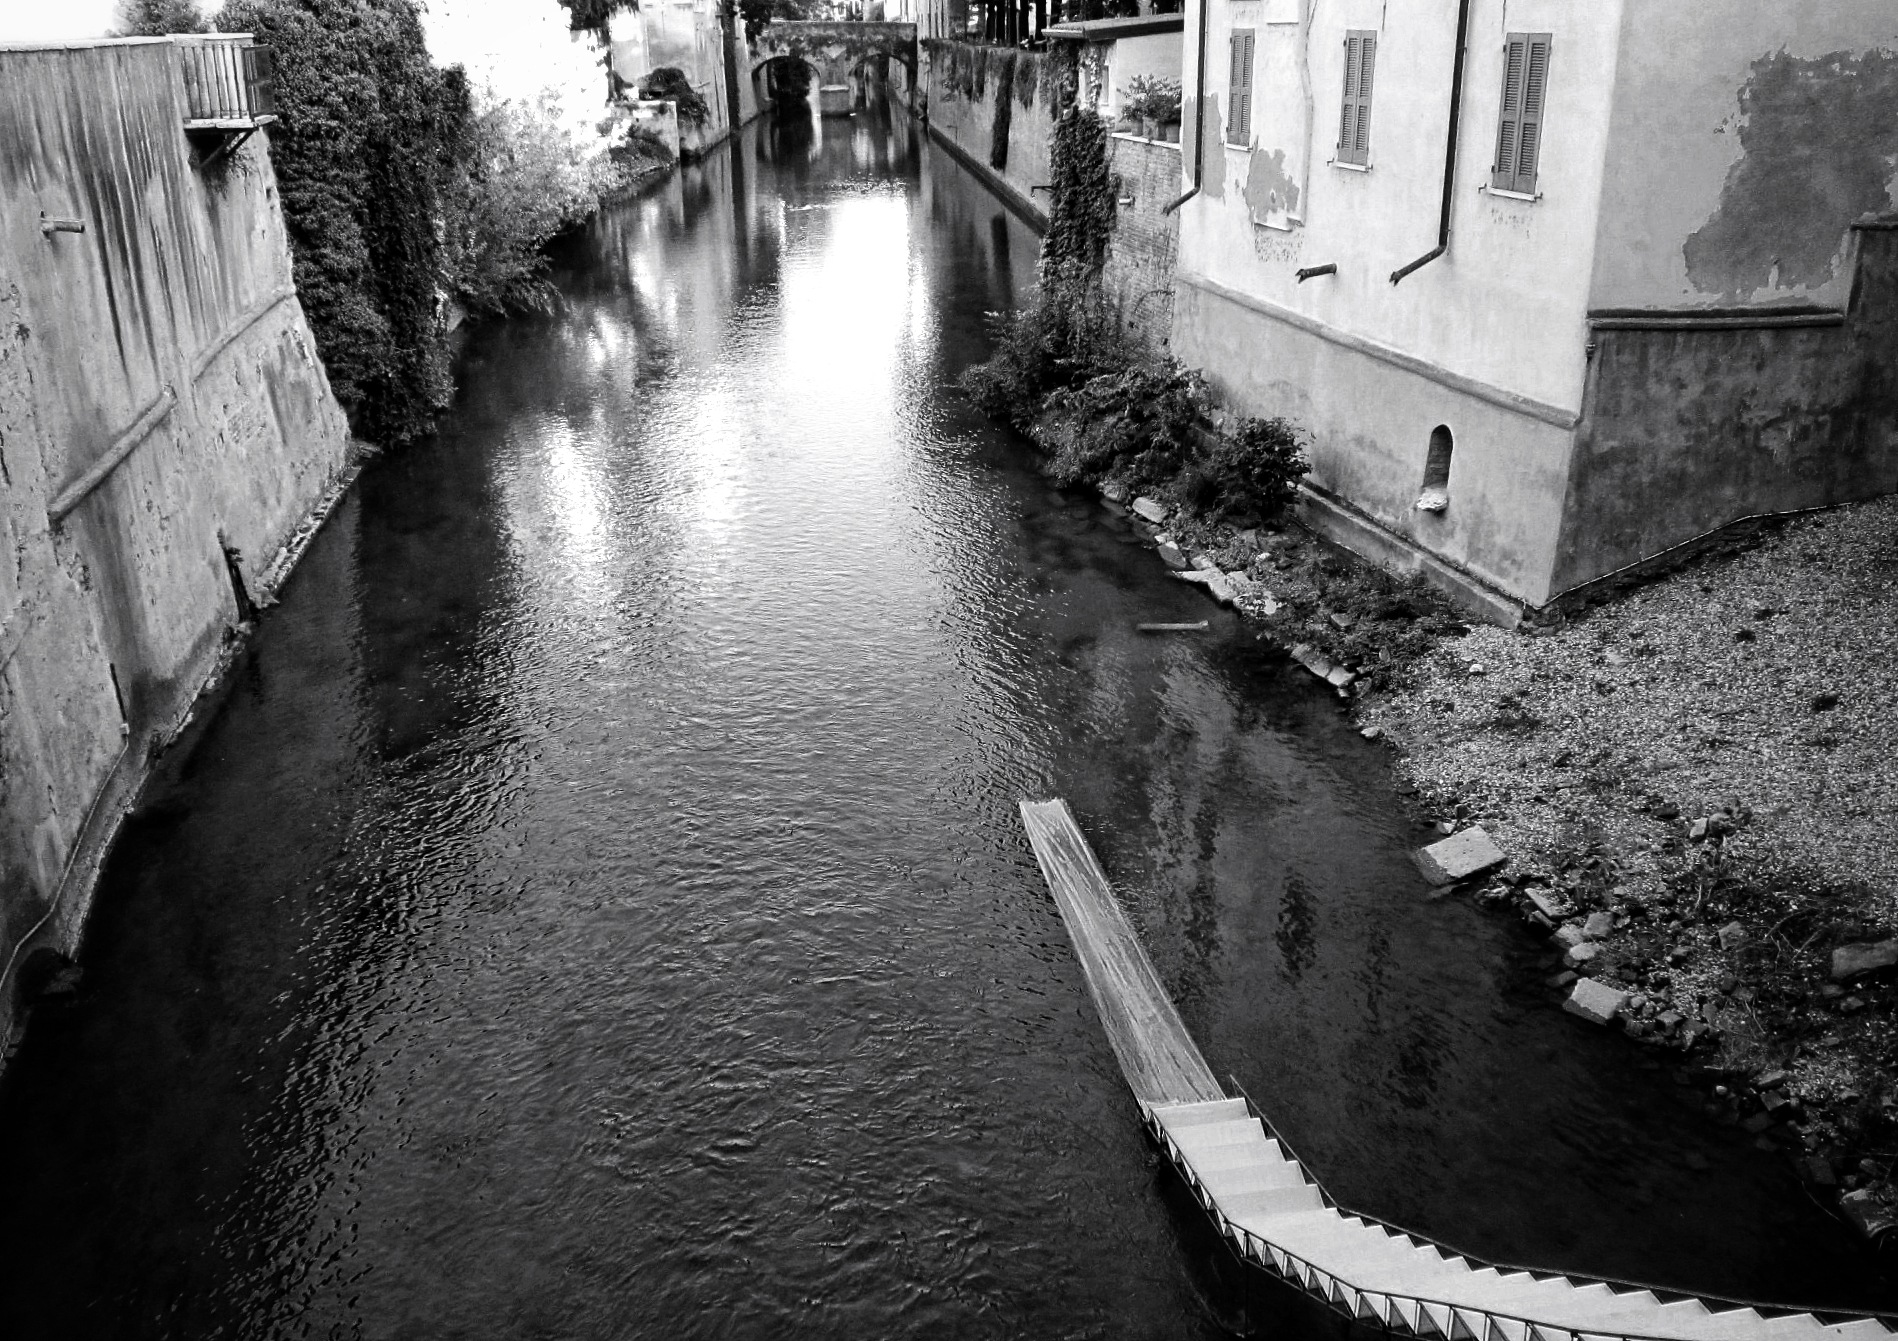 Take me to the water by Sergio Deggiovanni